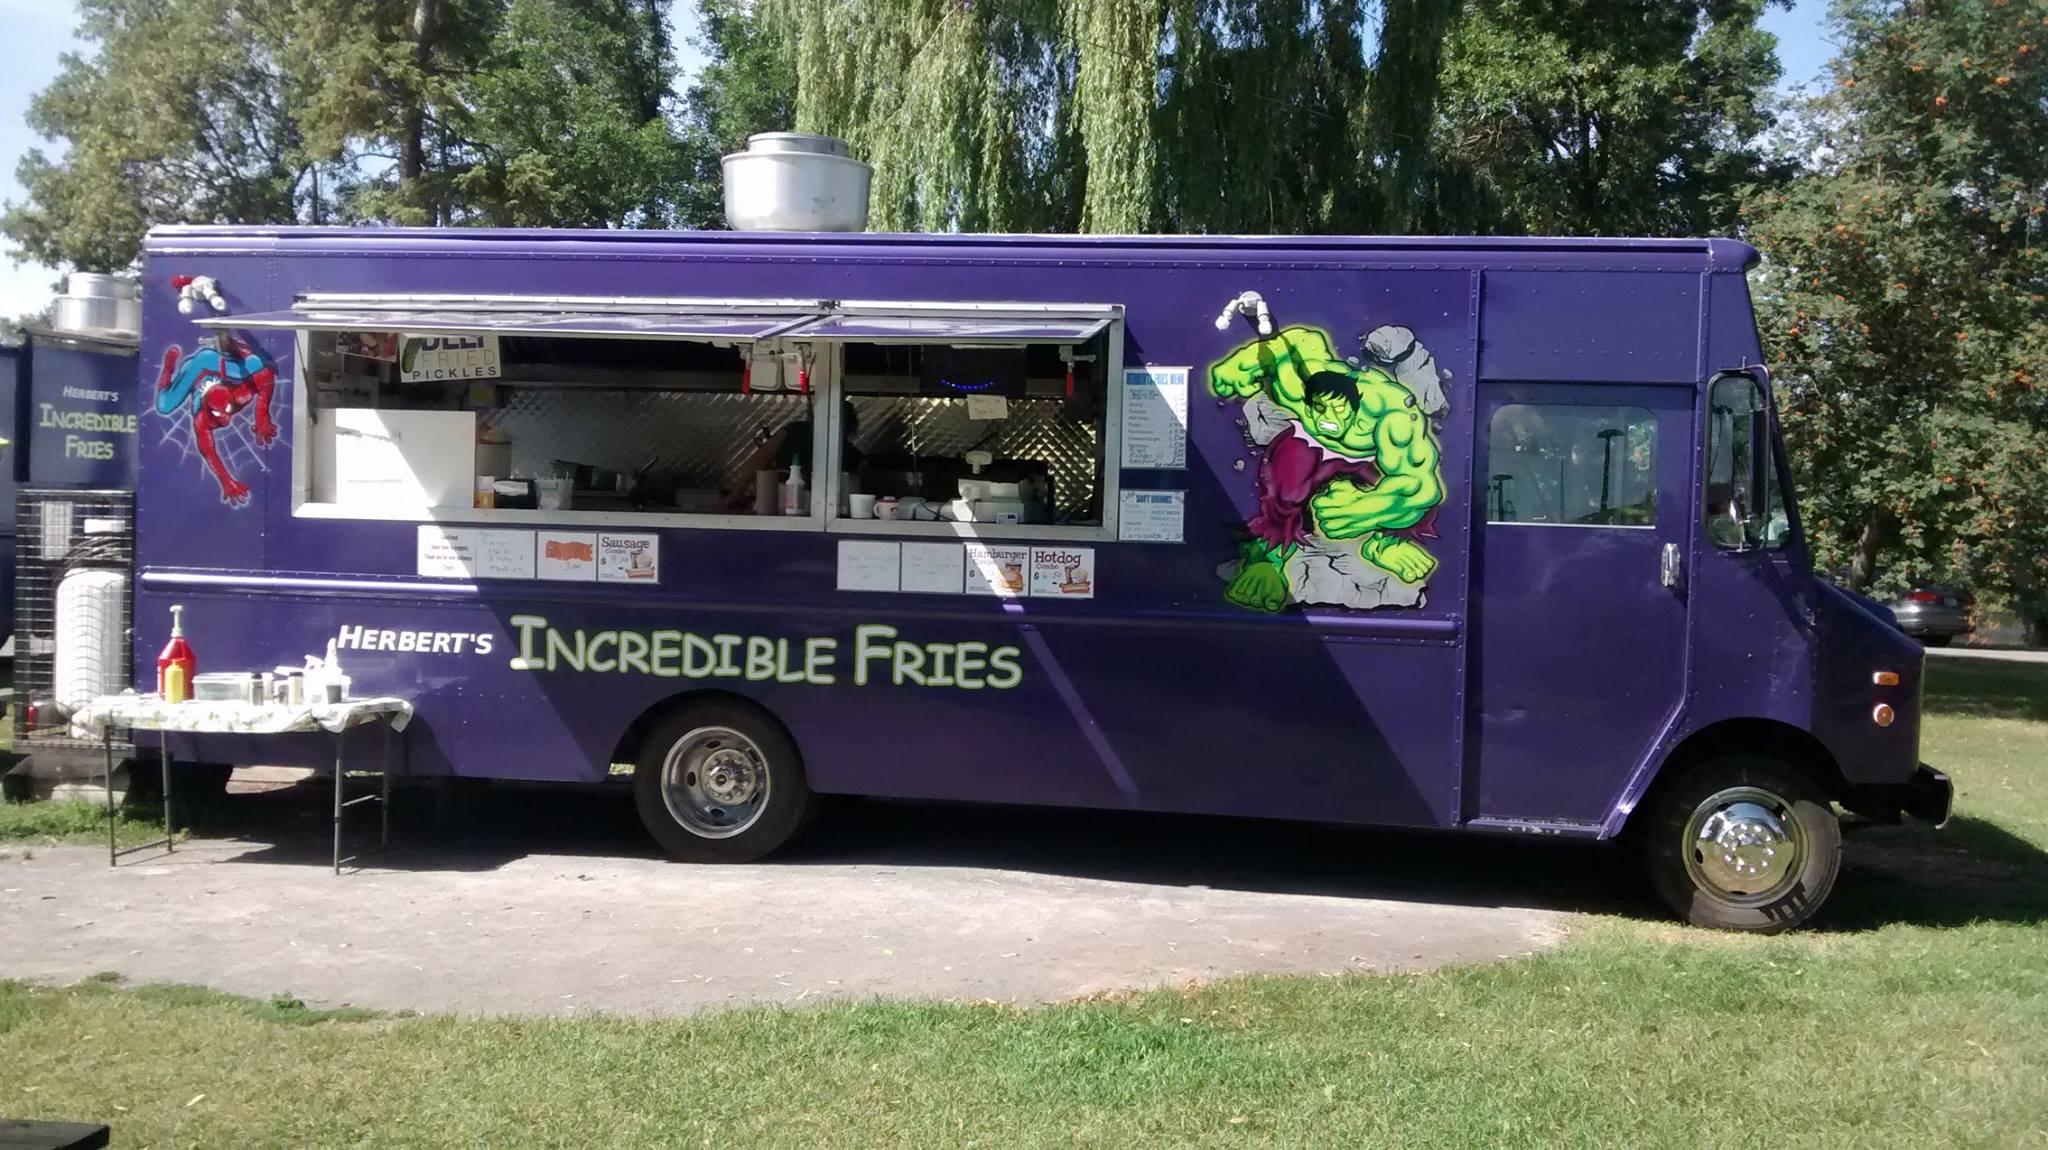 A purple food truck for Herbert's Incredible Fries.